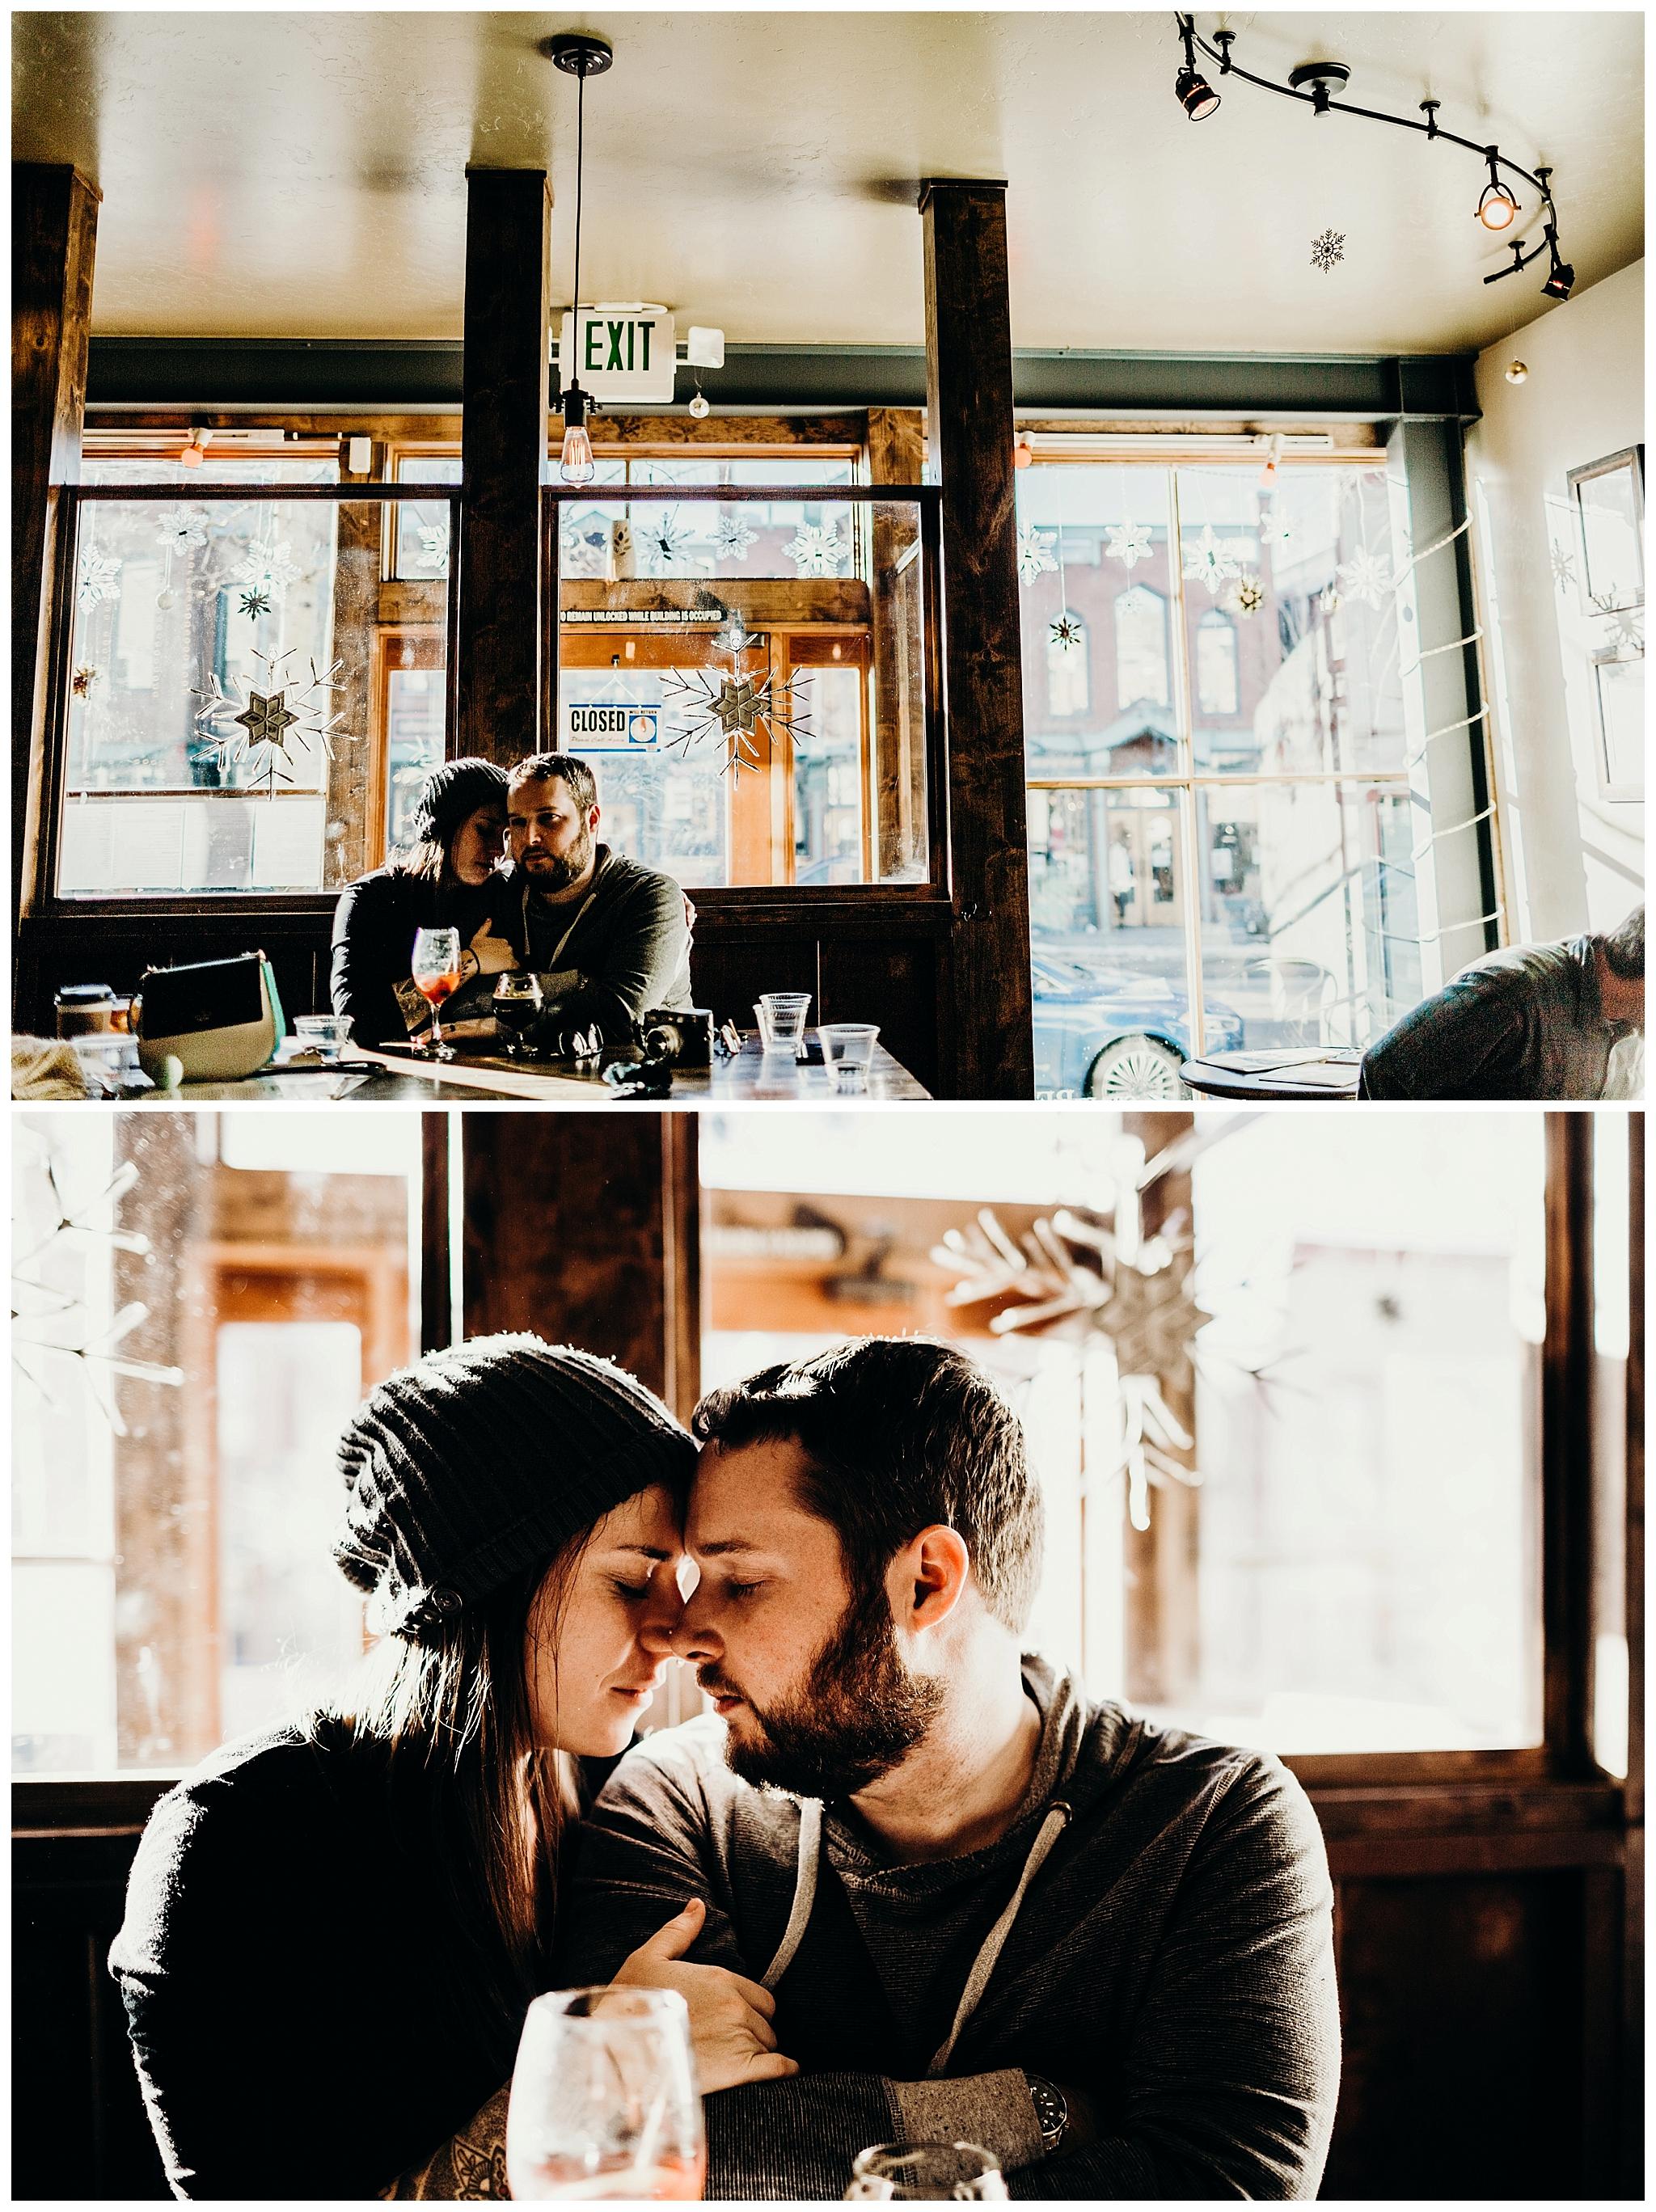 breckenridge-denver-colorado-utah-lifestyle-engagement-elopement-wedding-potographer-6.jpg